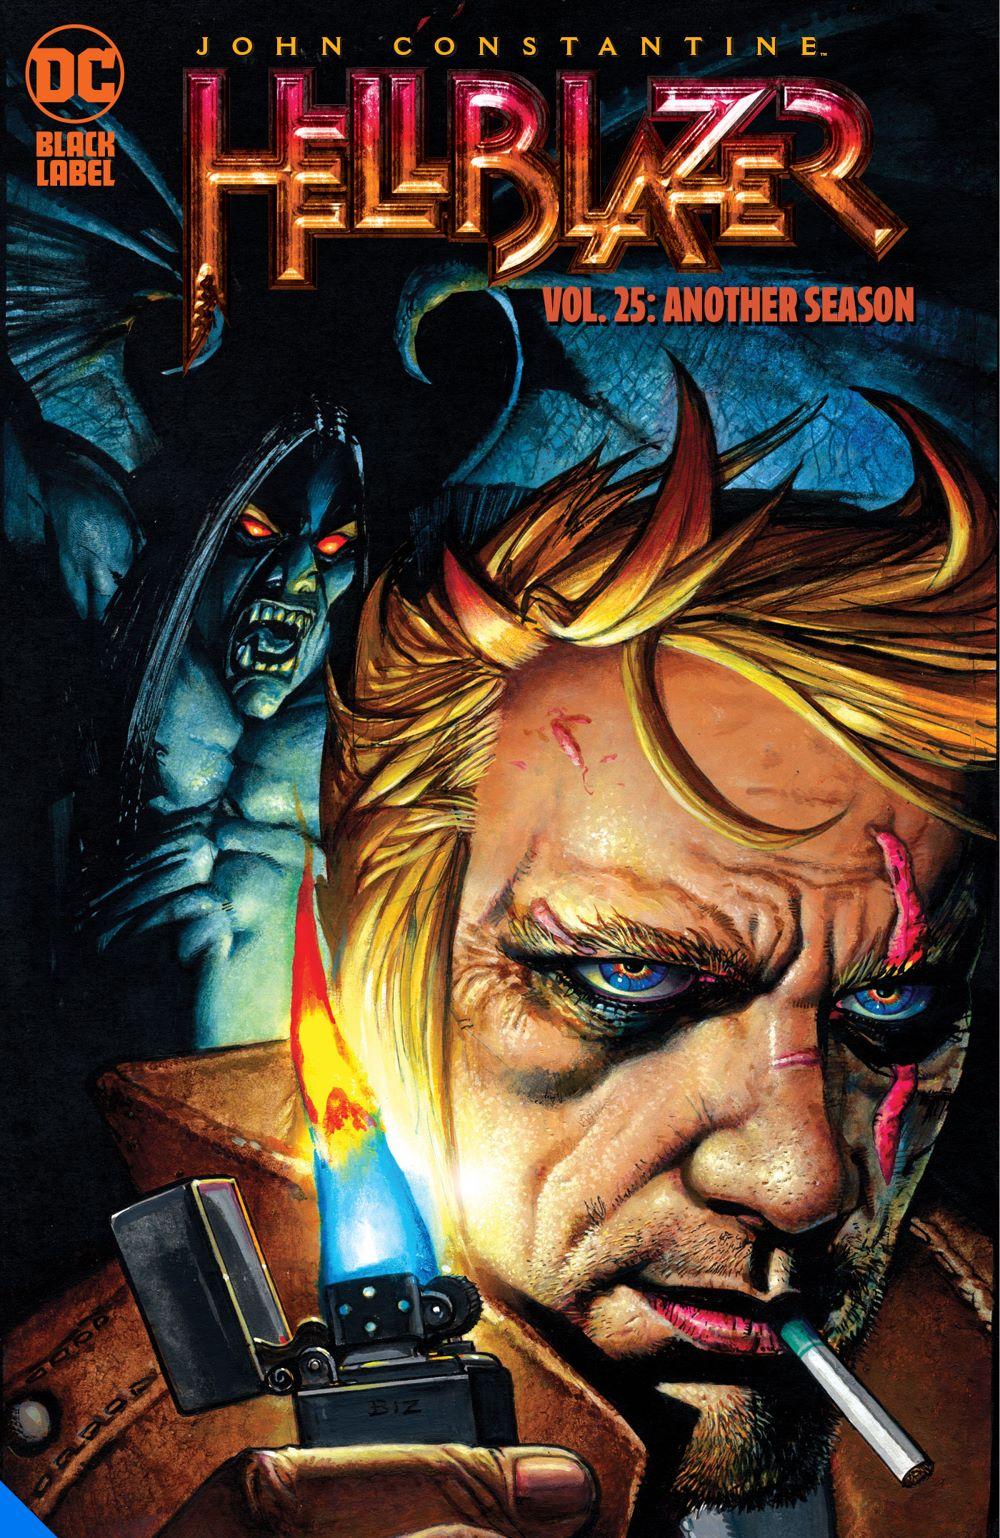 johnconstantinehellblazer-vol25_adv DC Comics July 2021 Solicitations